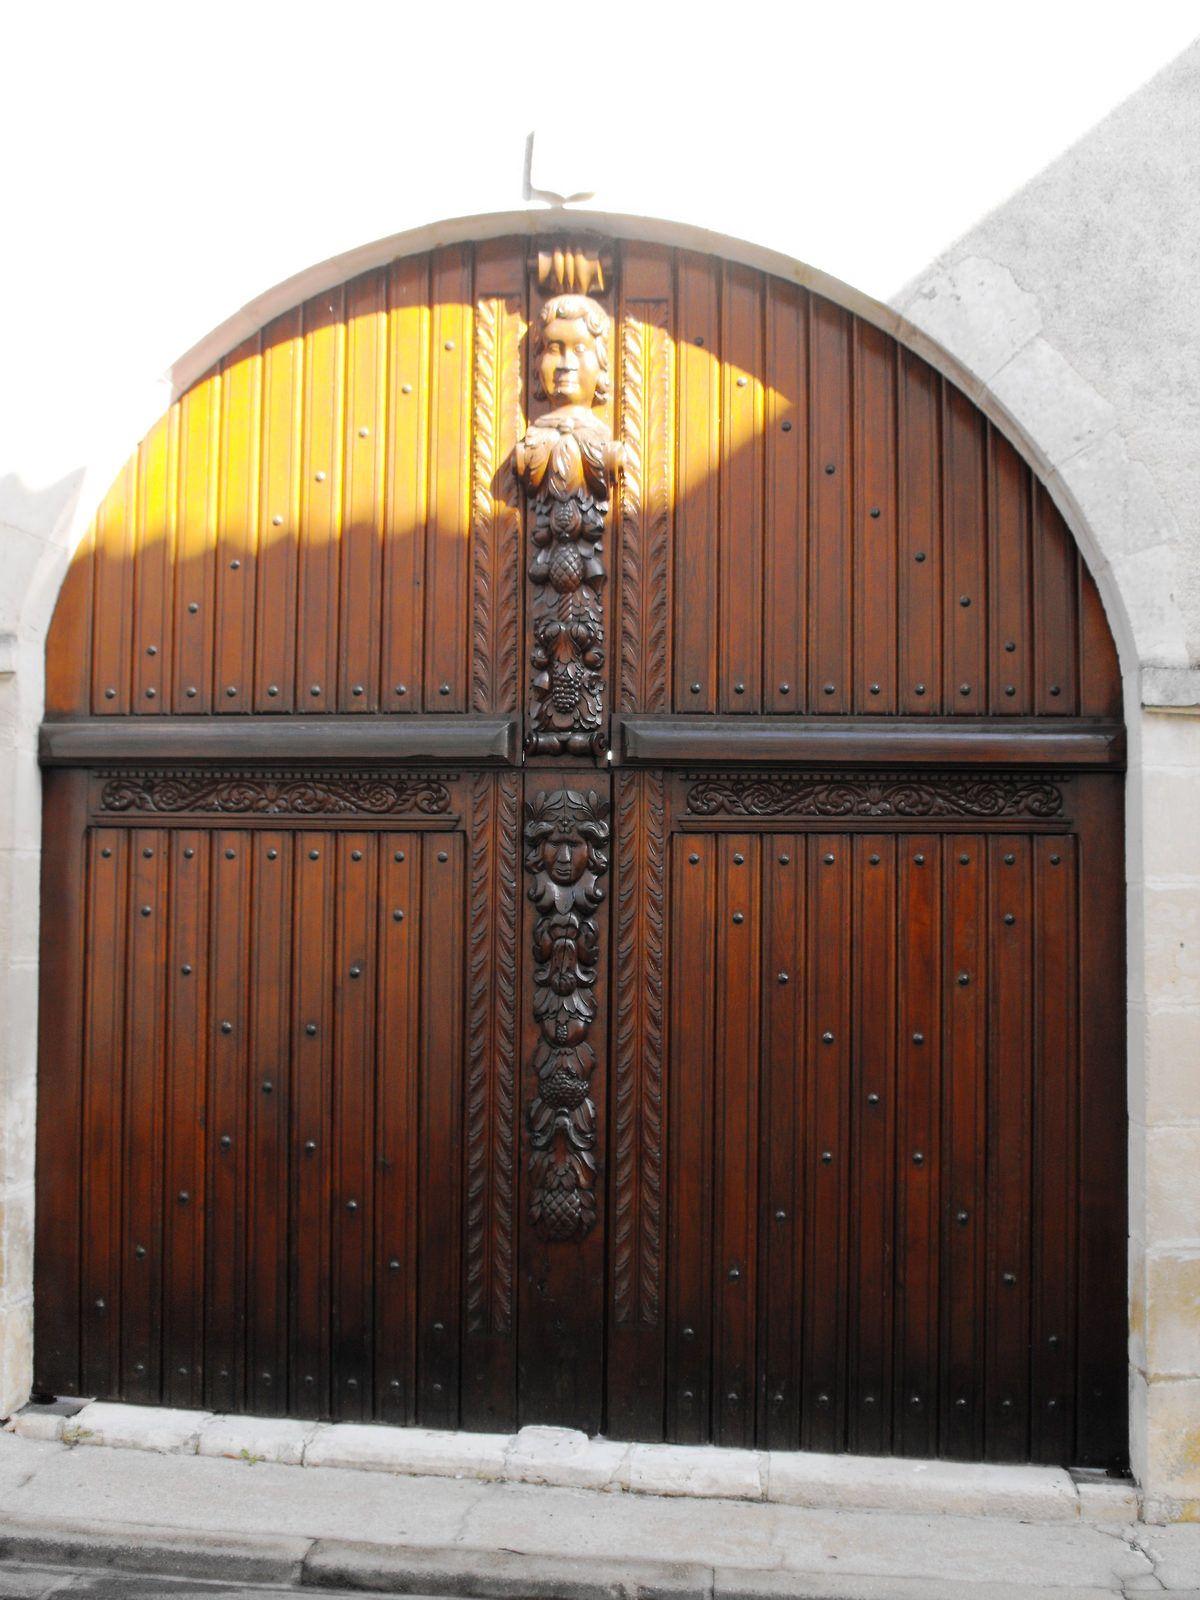 Hotel de la Prevote - built in the 15th Century - Louis Xlll stayed in the hotel in 1616 Civray - France